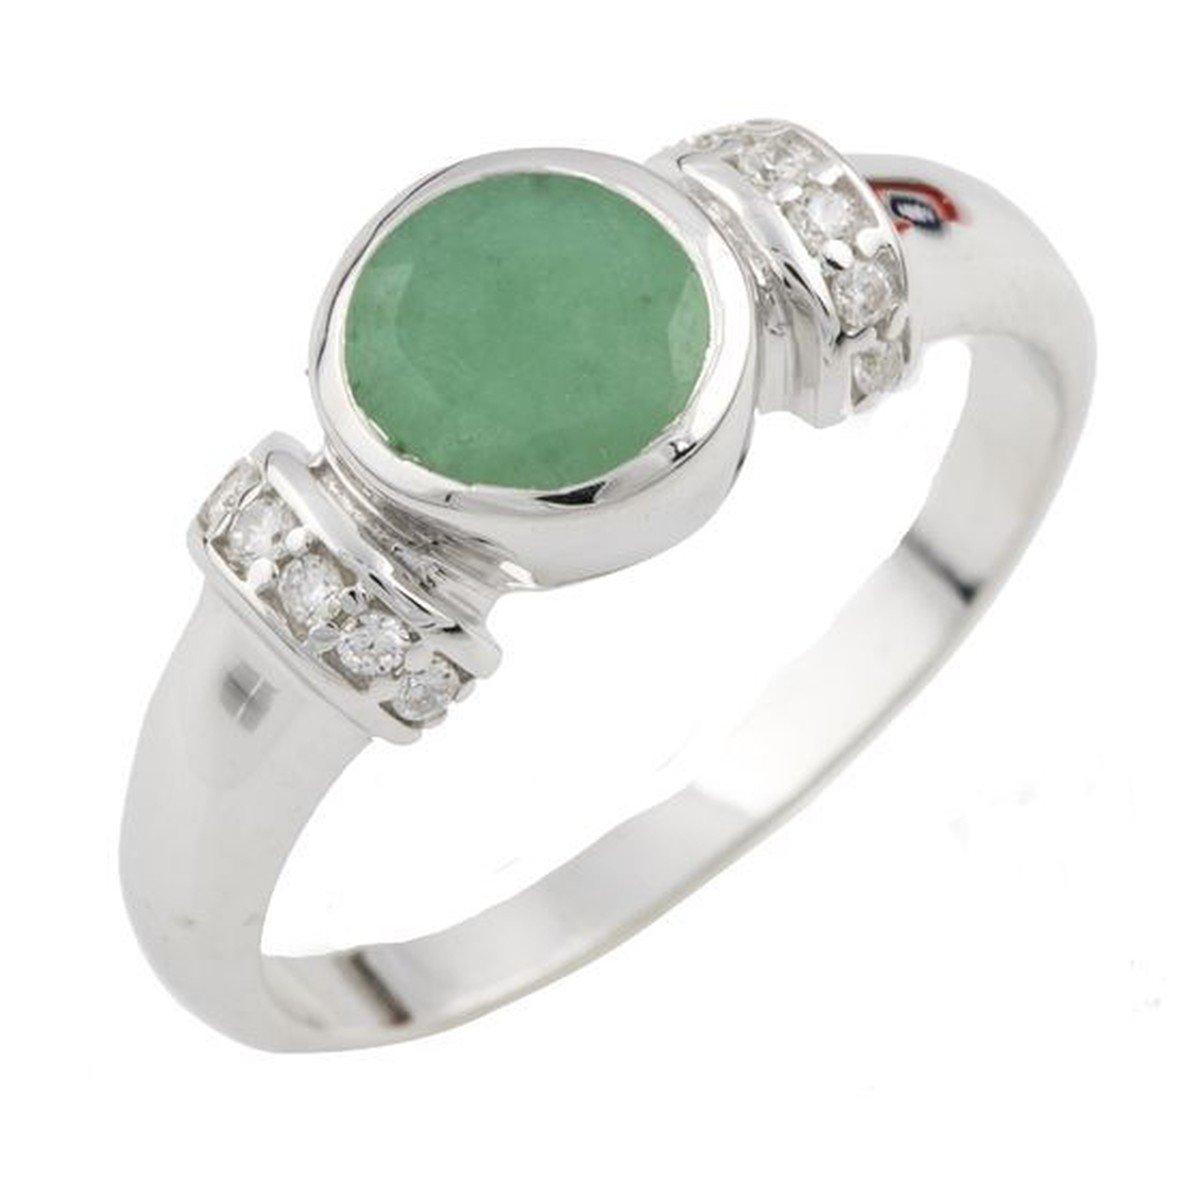 Серебряное кольцо DreamJewelry с натуральным агатом (1137550) 17 размер